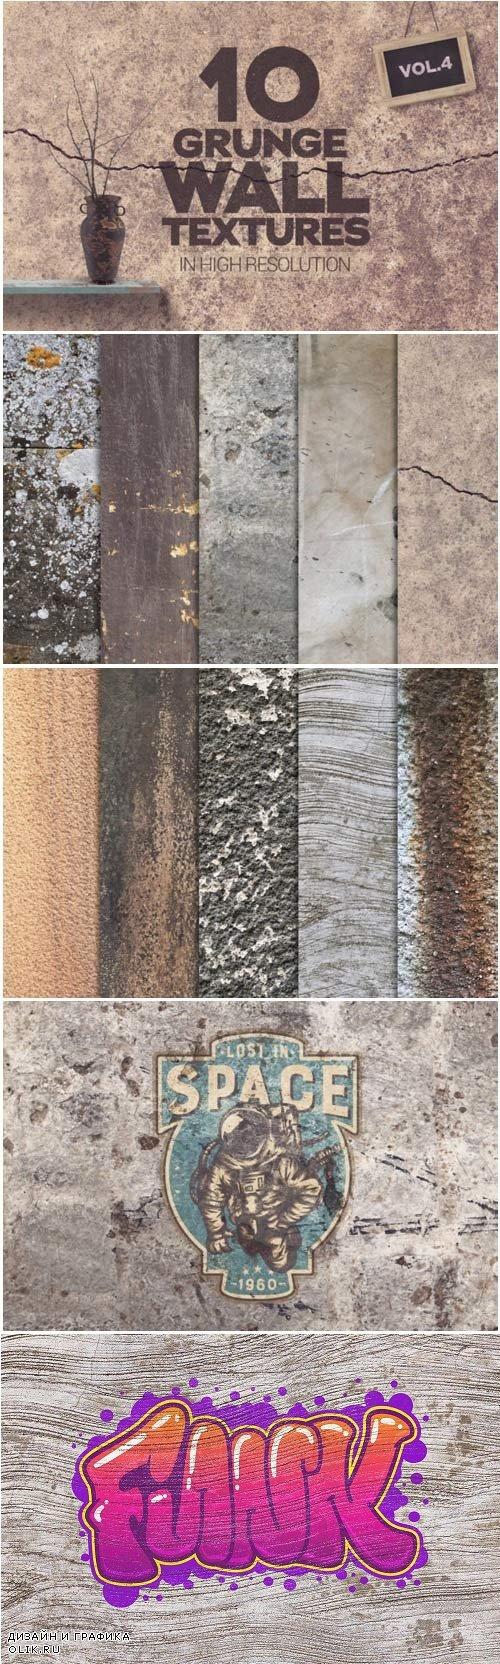 Grunge Wall Textures Vol 4 x10 3976494